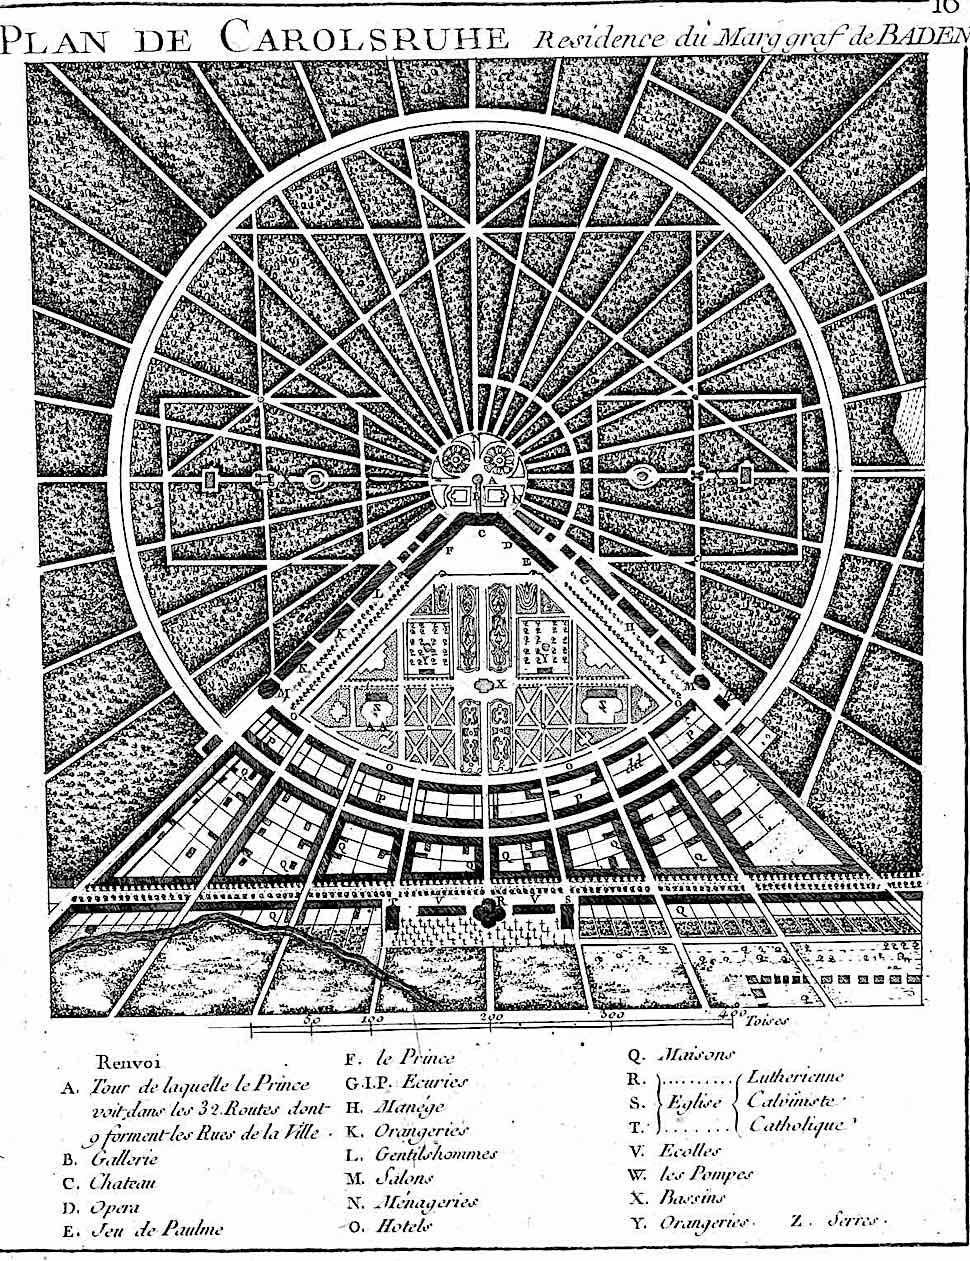 a 1776 garden layout illustration, Plan de Carolsruhe, residence du Marggraf de Baden